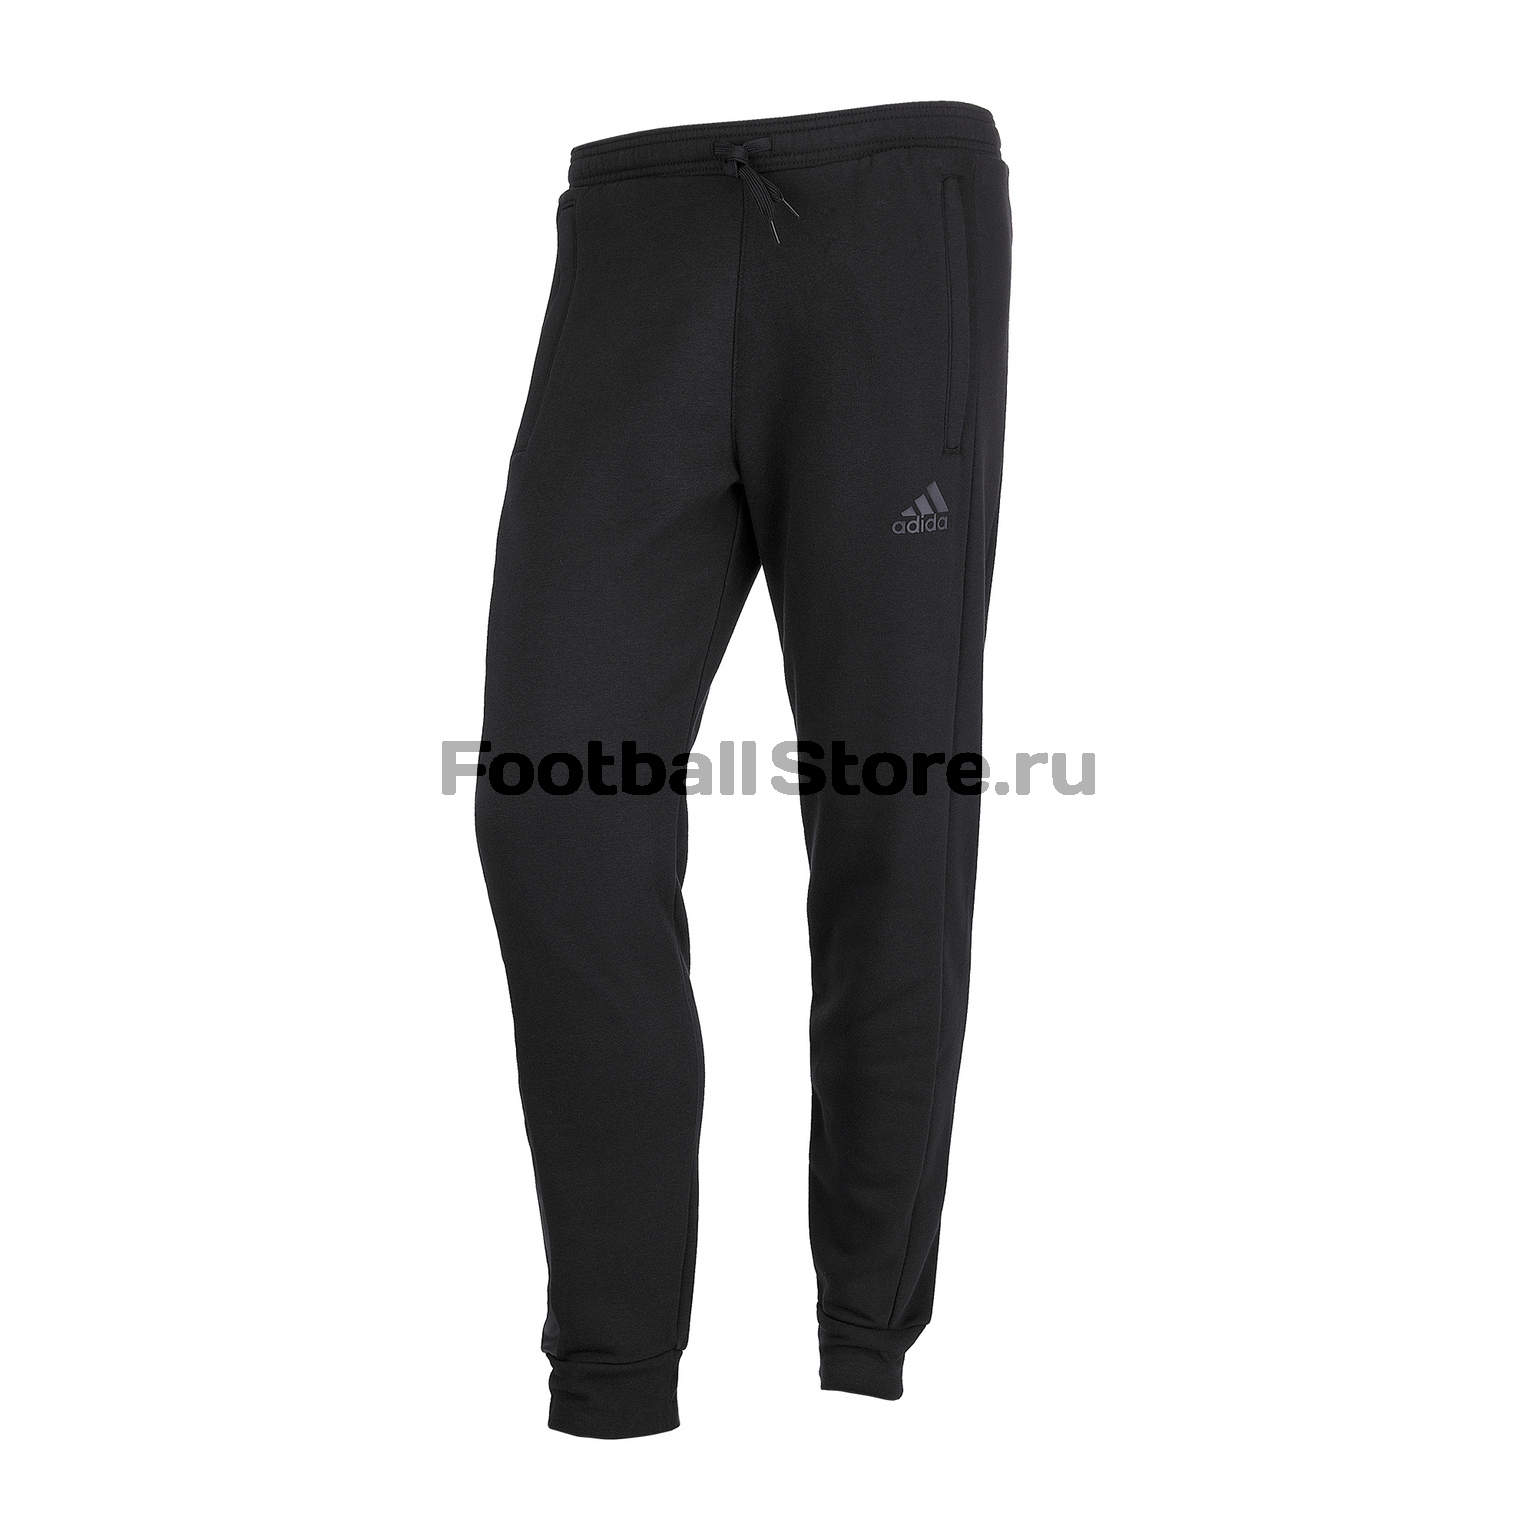 Брюки Adidas Tango Joggers EJ0945